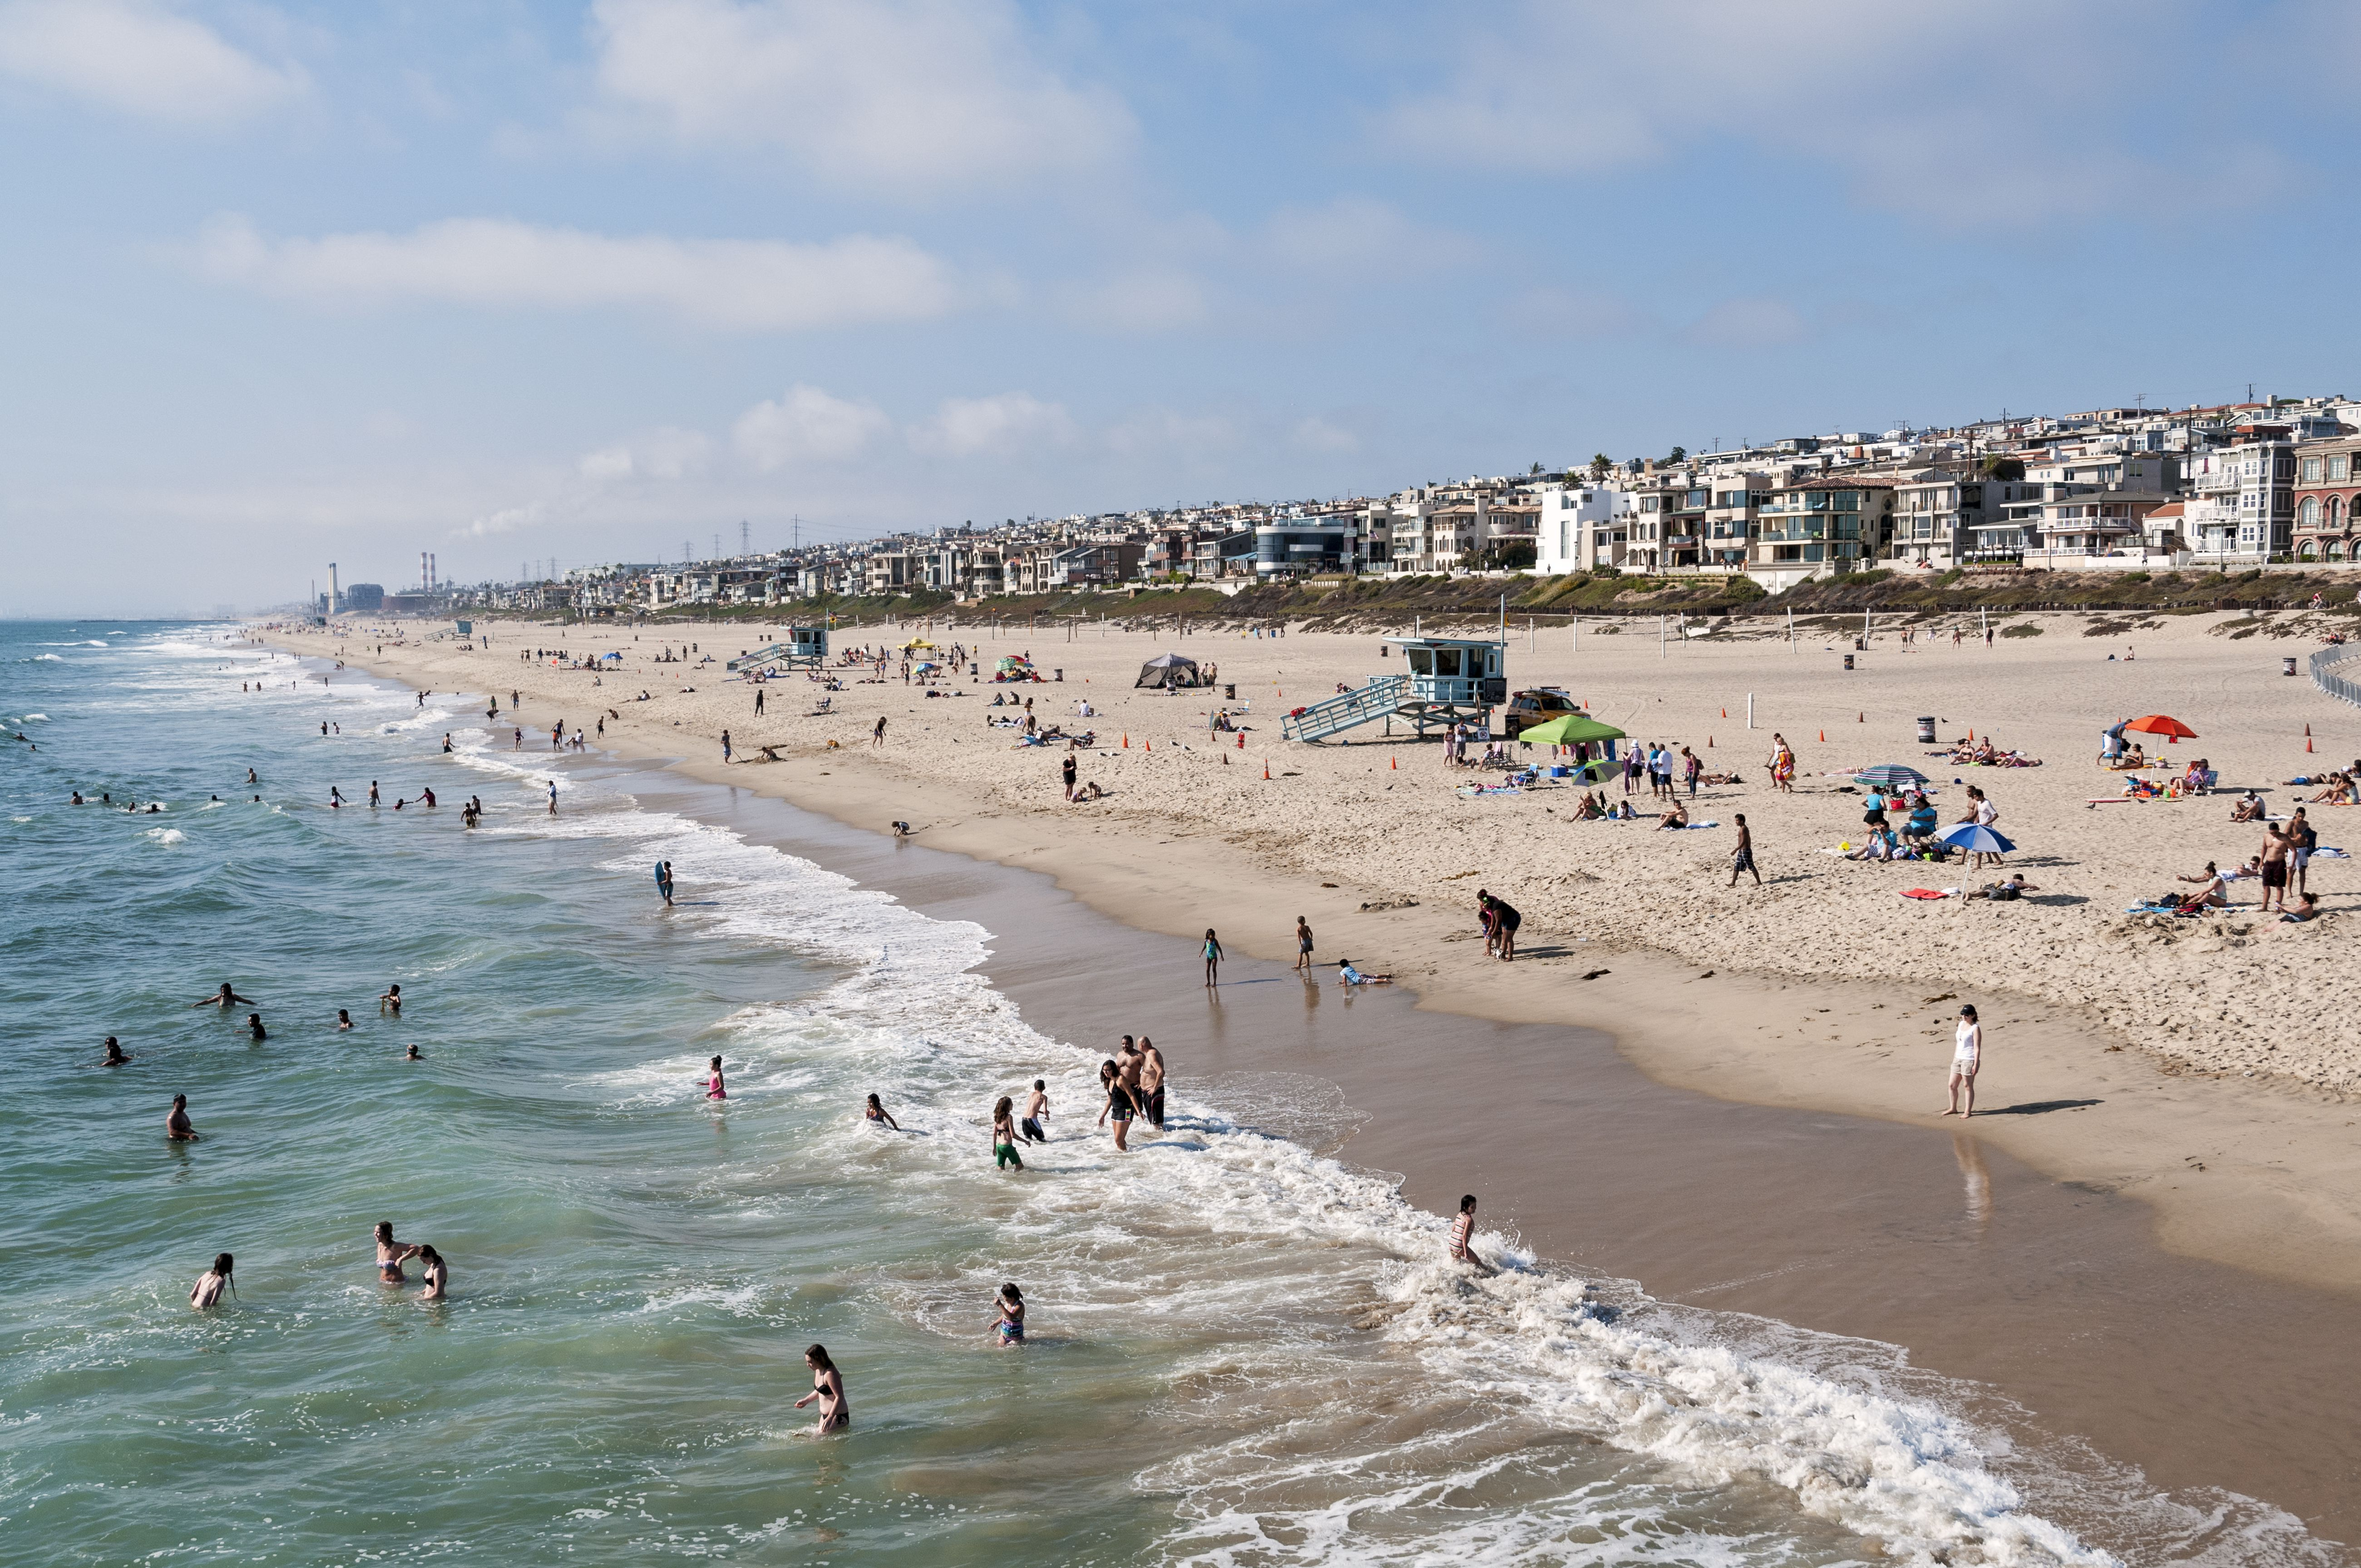 Manhattan Beach Tourism: TripAdvisor has 18, reviews of Manhattan Beach Hotels, Attractions, and Restaurants making it your best Manhattan Beach resource.